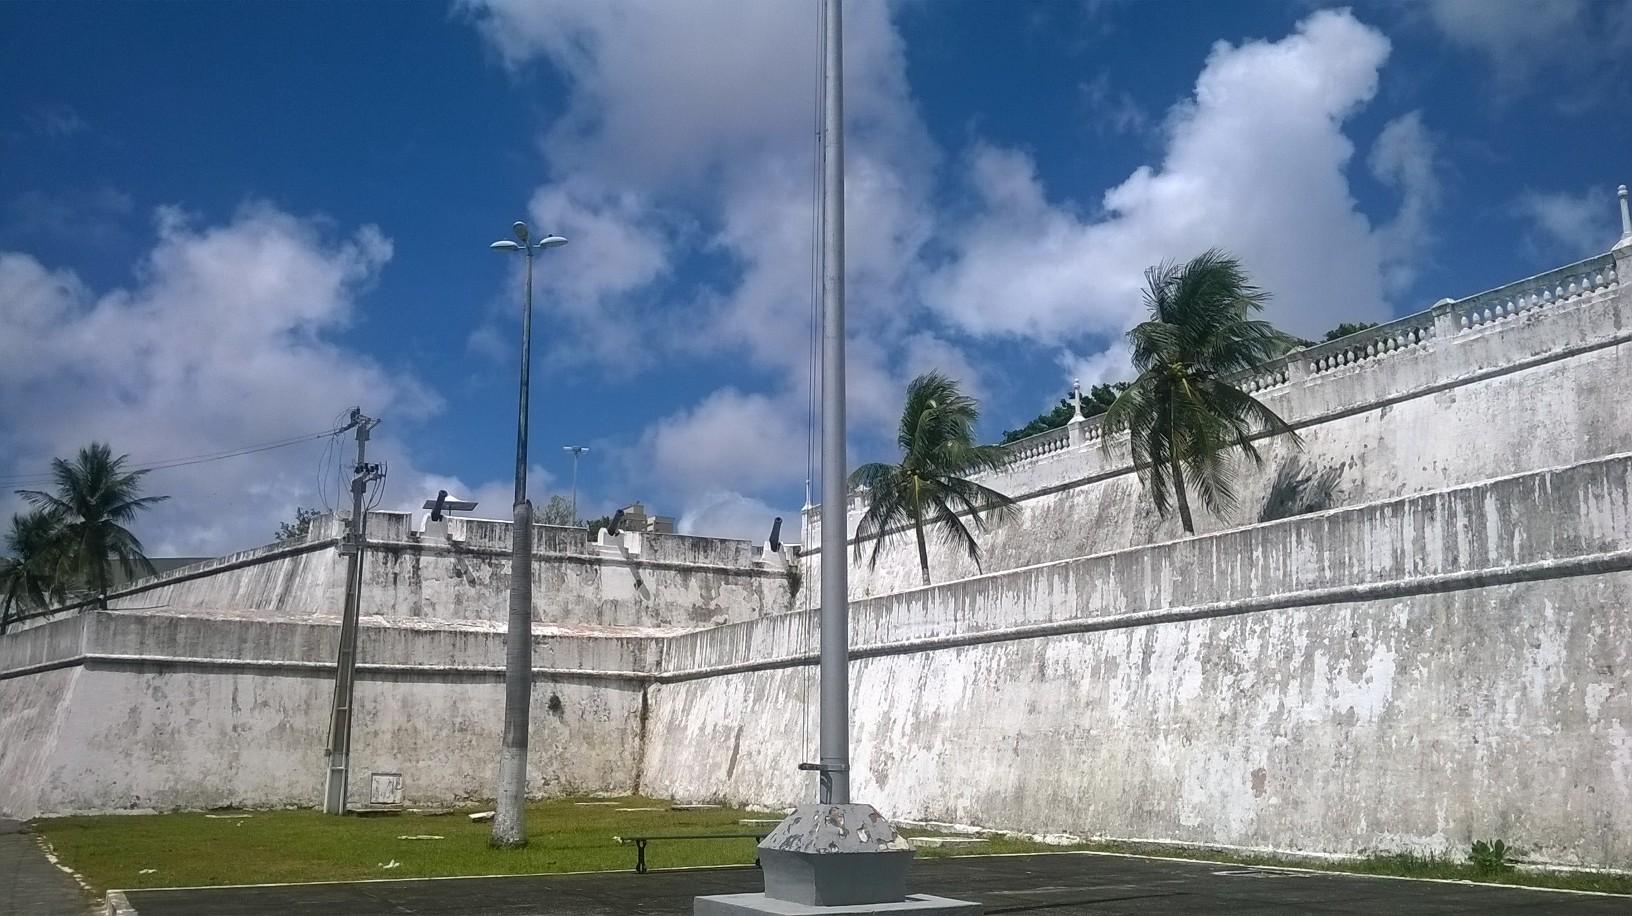 forta-castle-left-side-may16